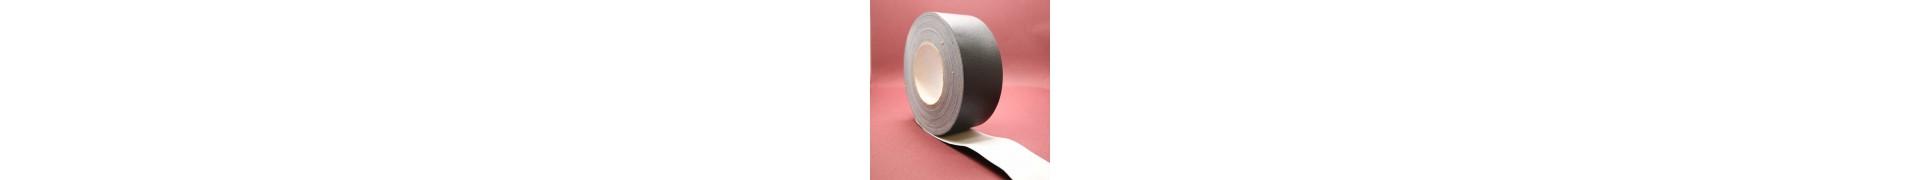 ADHESIF TOILE PLASTIFI1200 Rl 38 mm 25 M NOIR